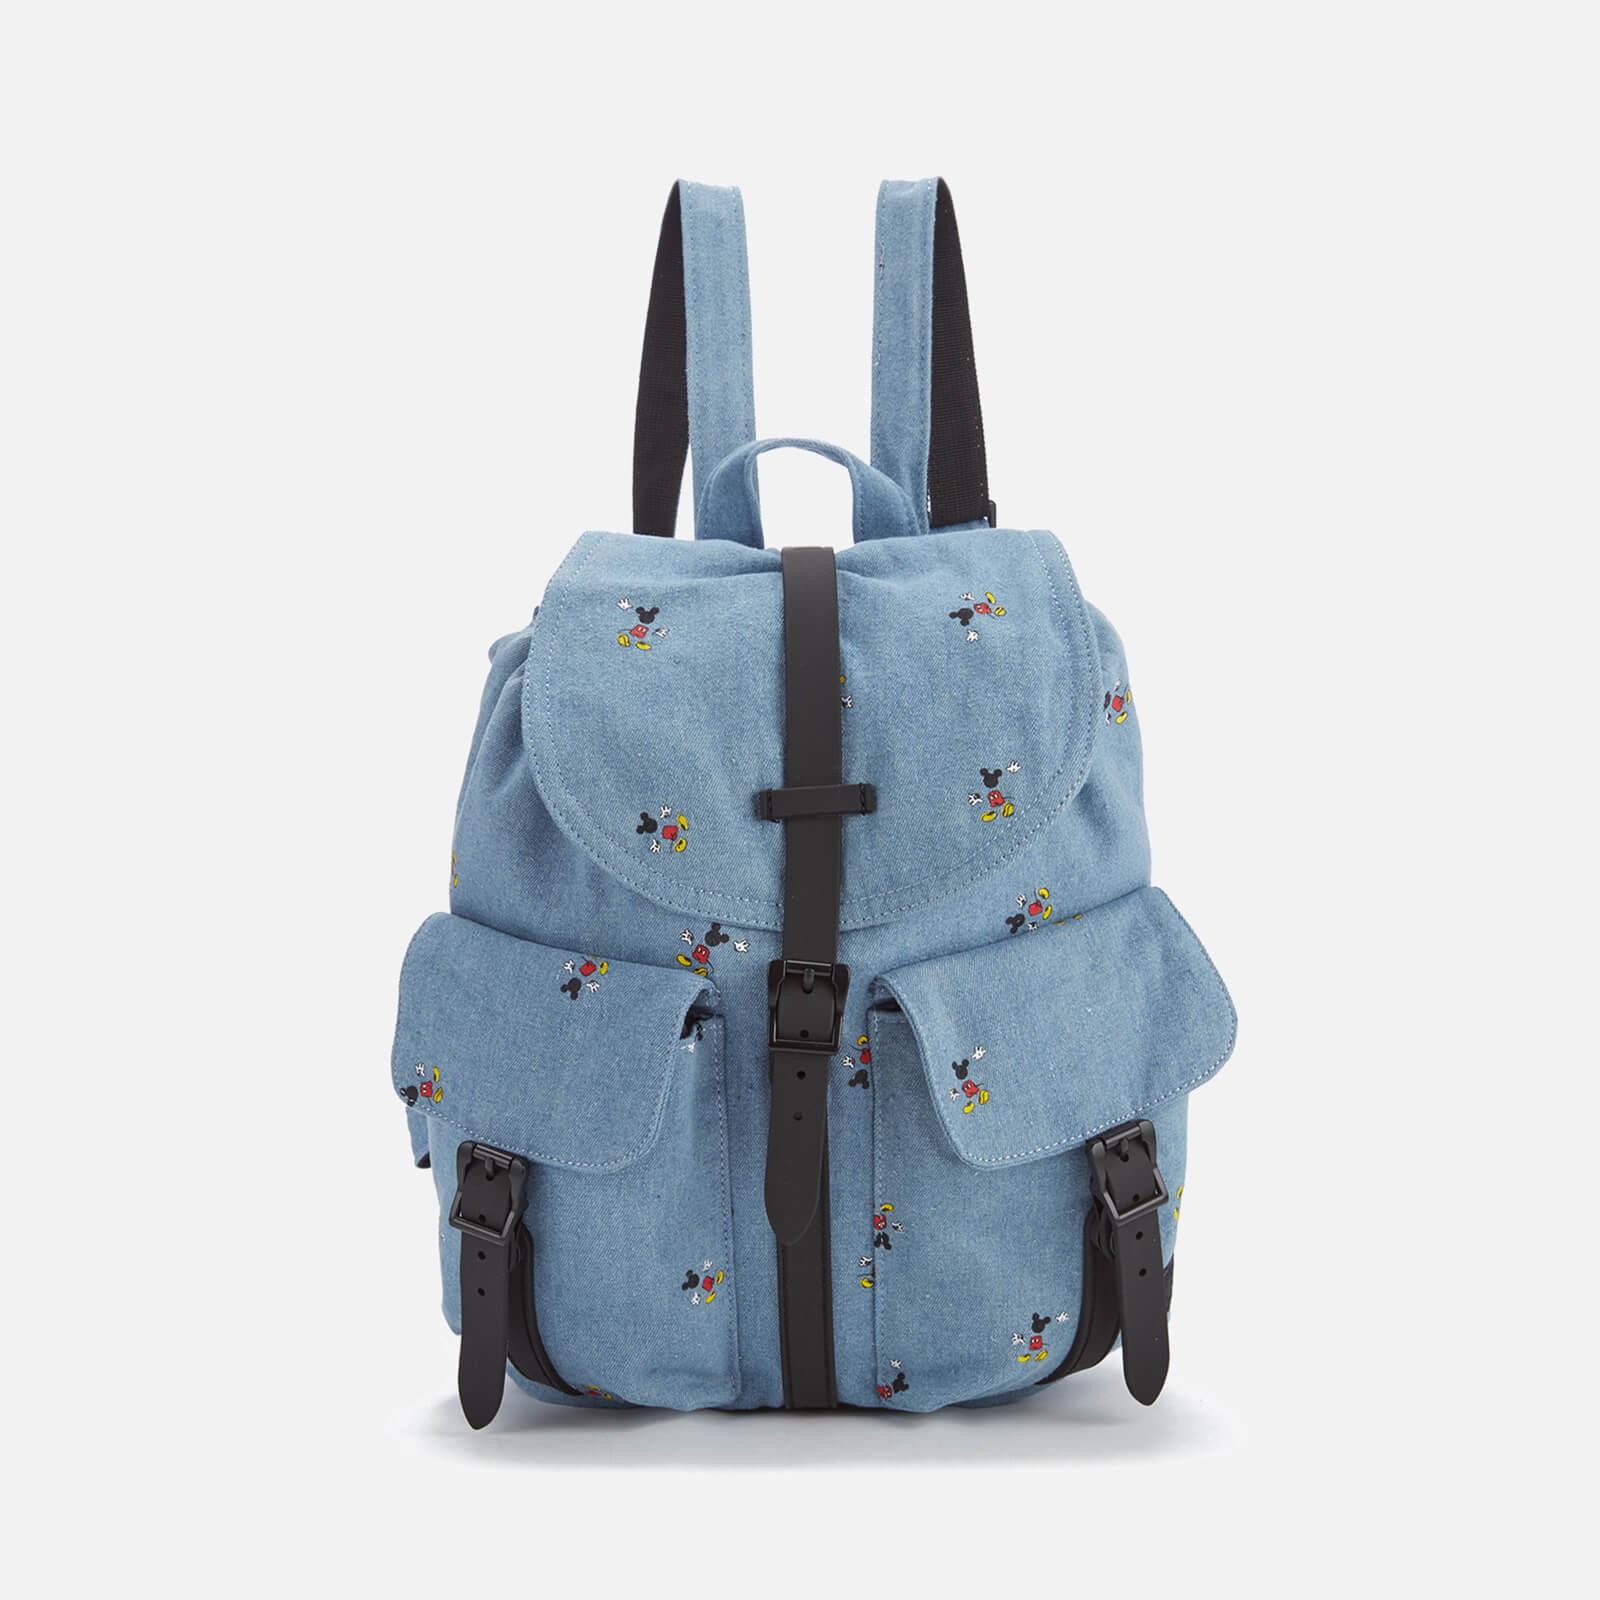 info for 50054 890c0 Herschel Supply Co. Women s Dawson Disney Backpack - Denim Black Poly -  Free UK Delivery over £50